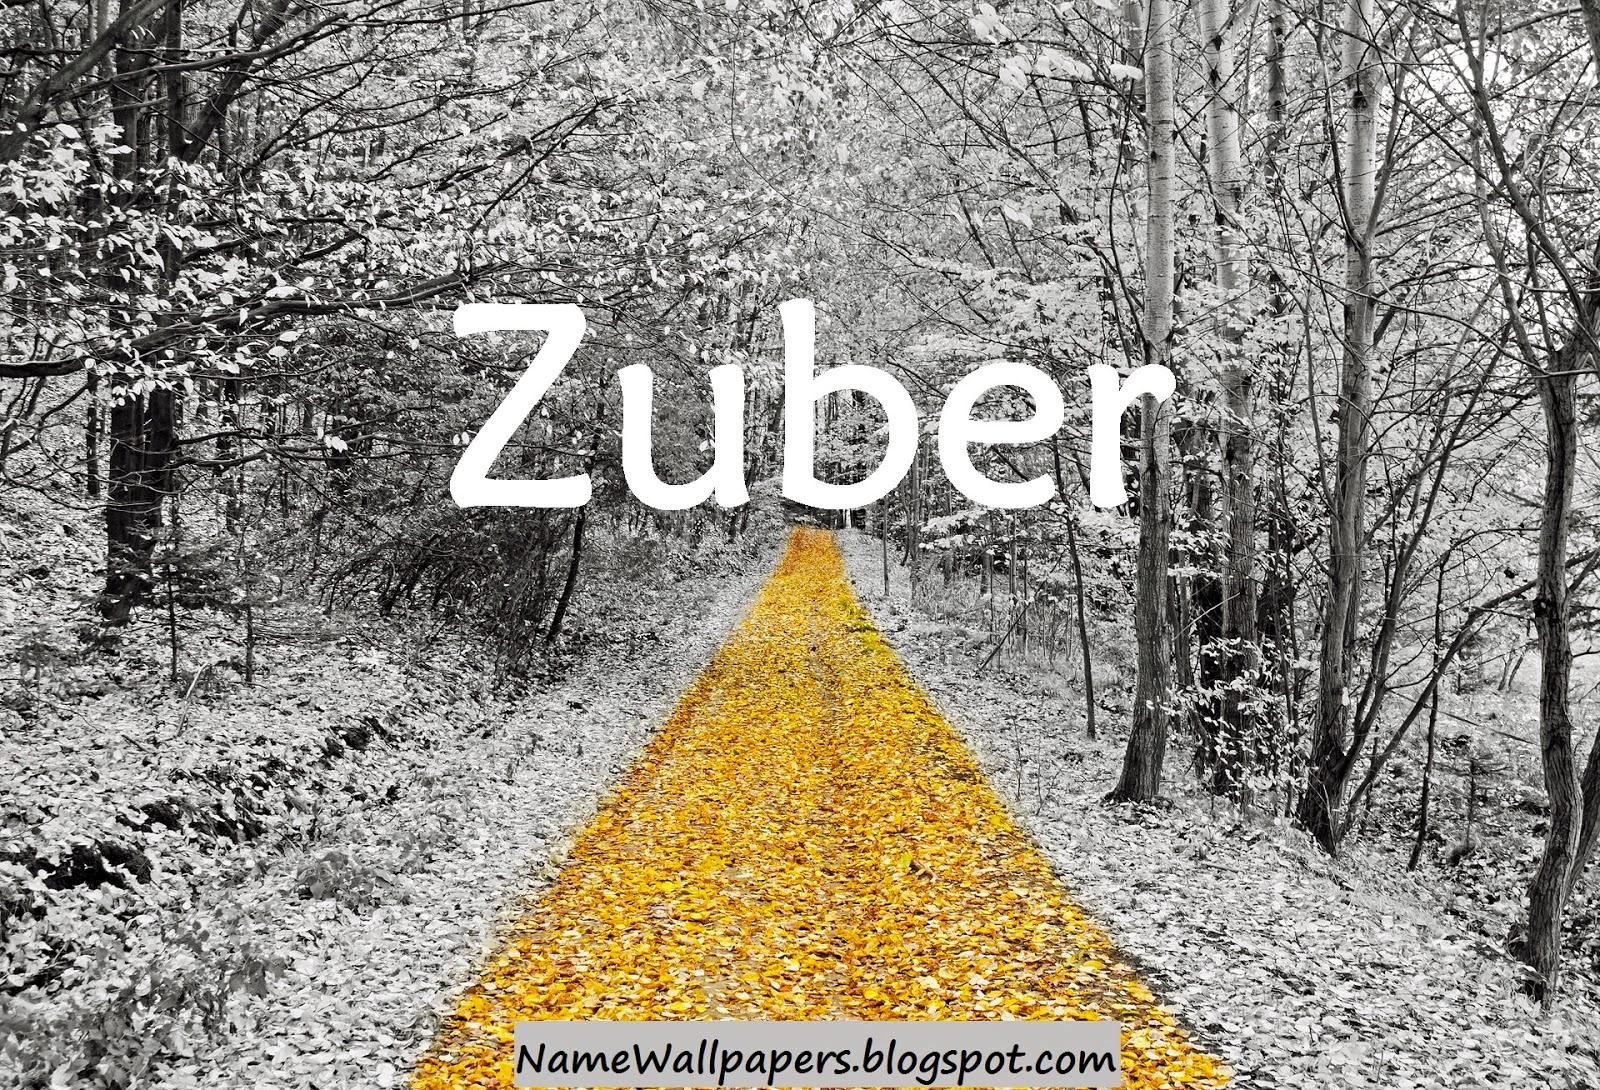 zuber name wallpapers zuber name wallpaper urdu name